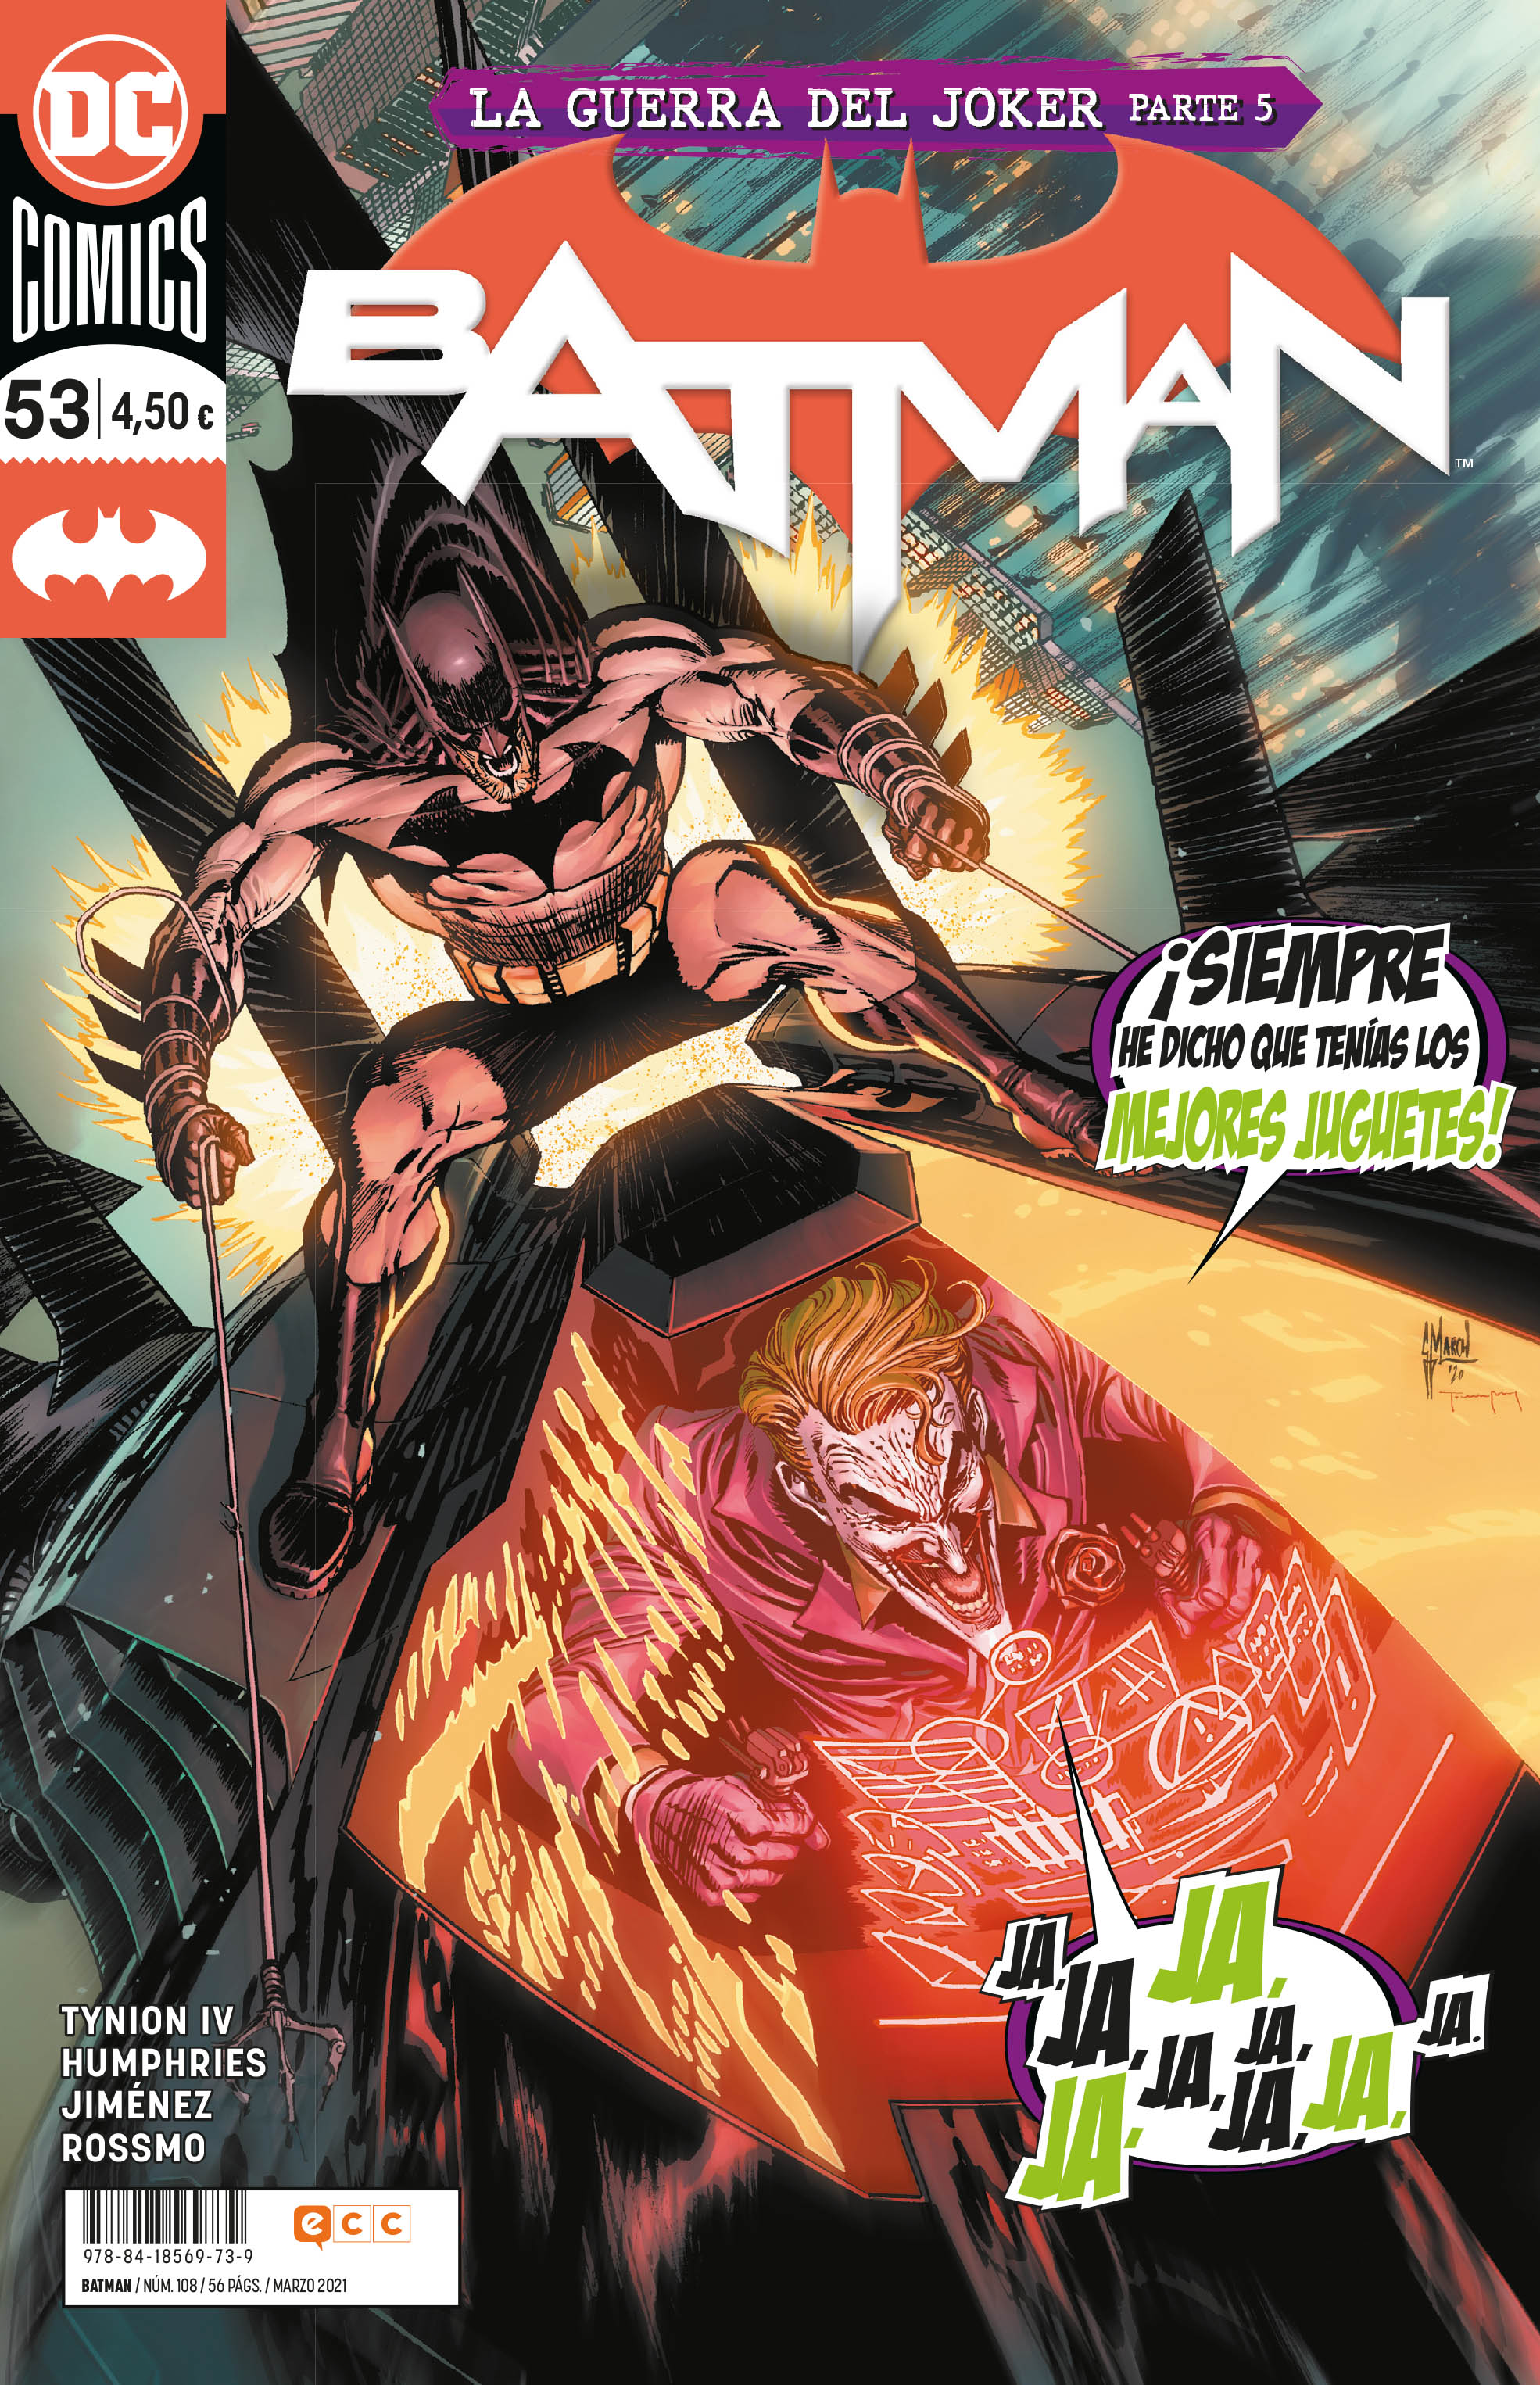 Batman #108 / 53